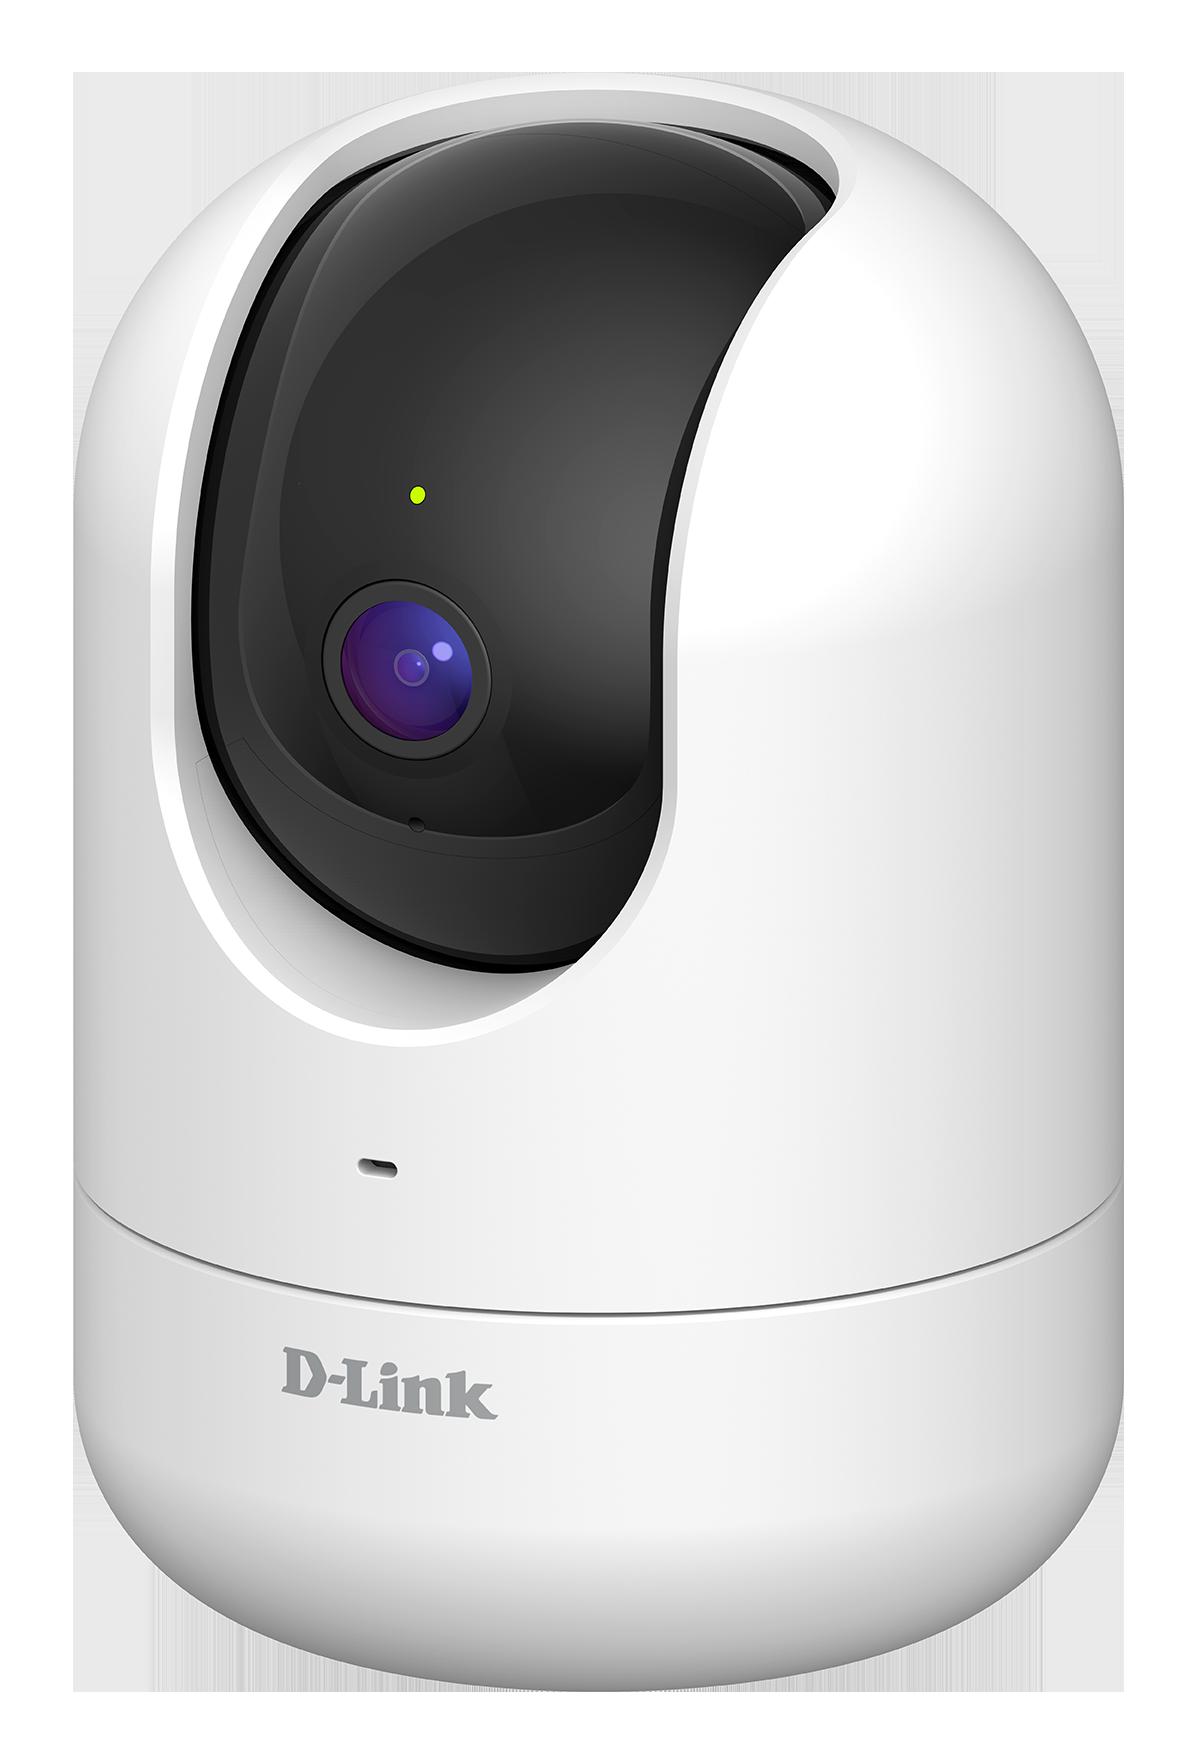 D-Link DCS-8526LH Full HD Pan & Tilt Wi-Fi Camera - DCS-8526LH